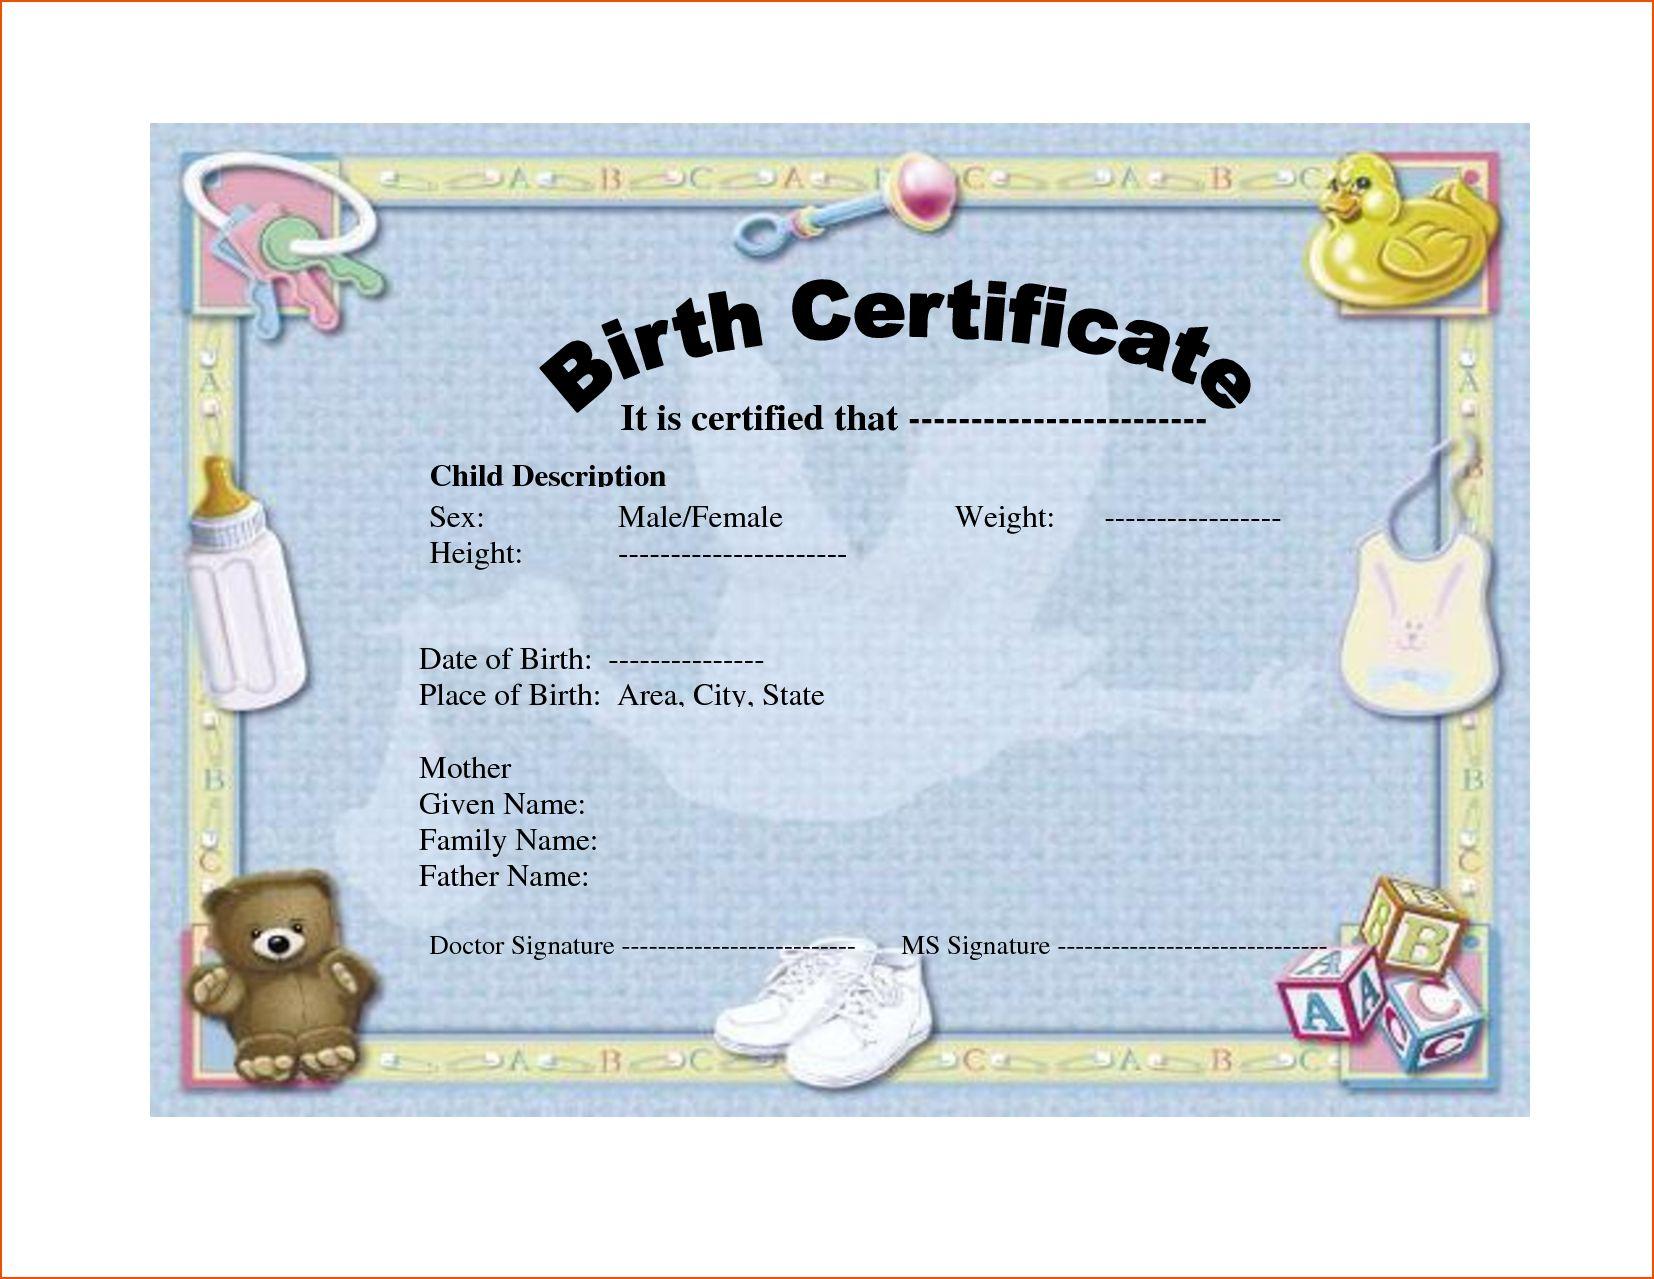 036 Birth Certificate Template Word Blank Mockup Rare